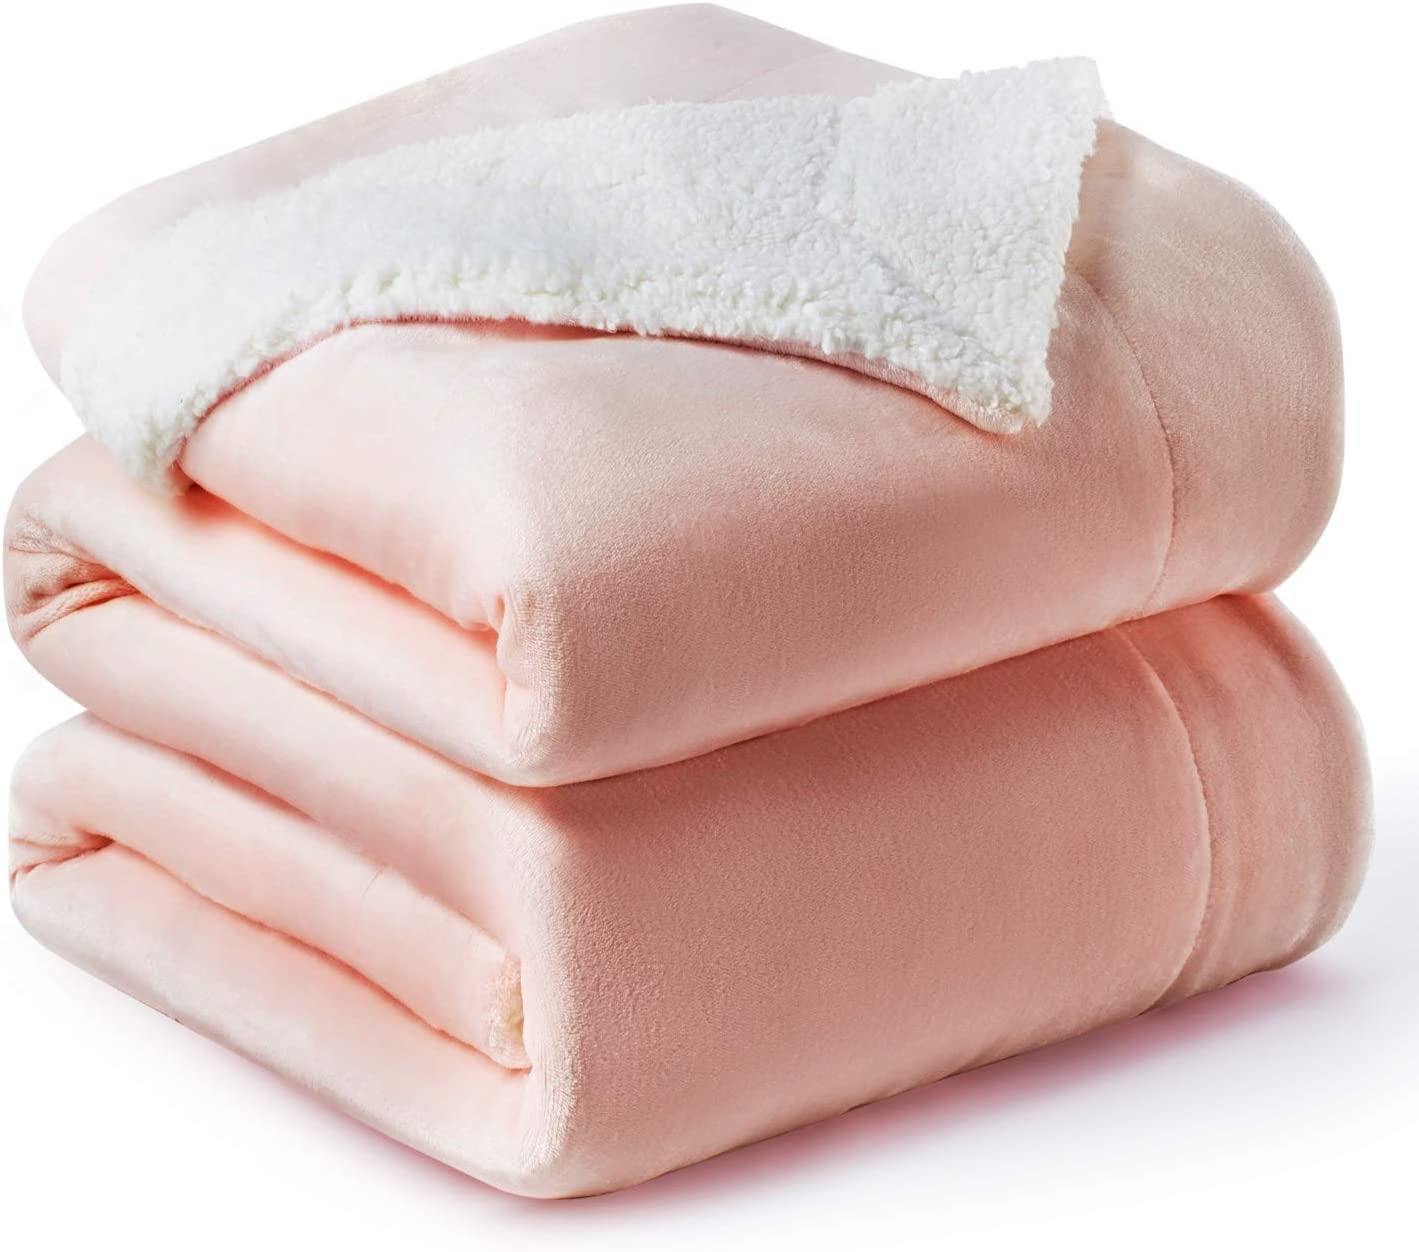 BEDSURE Sherpa Fleece Blanket Queen Size(Not Electrical) Dusty Pink Plush Blanket Fuzzy Soft Blanket Microfiber